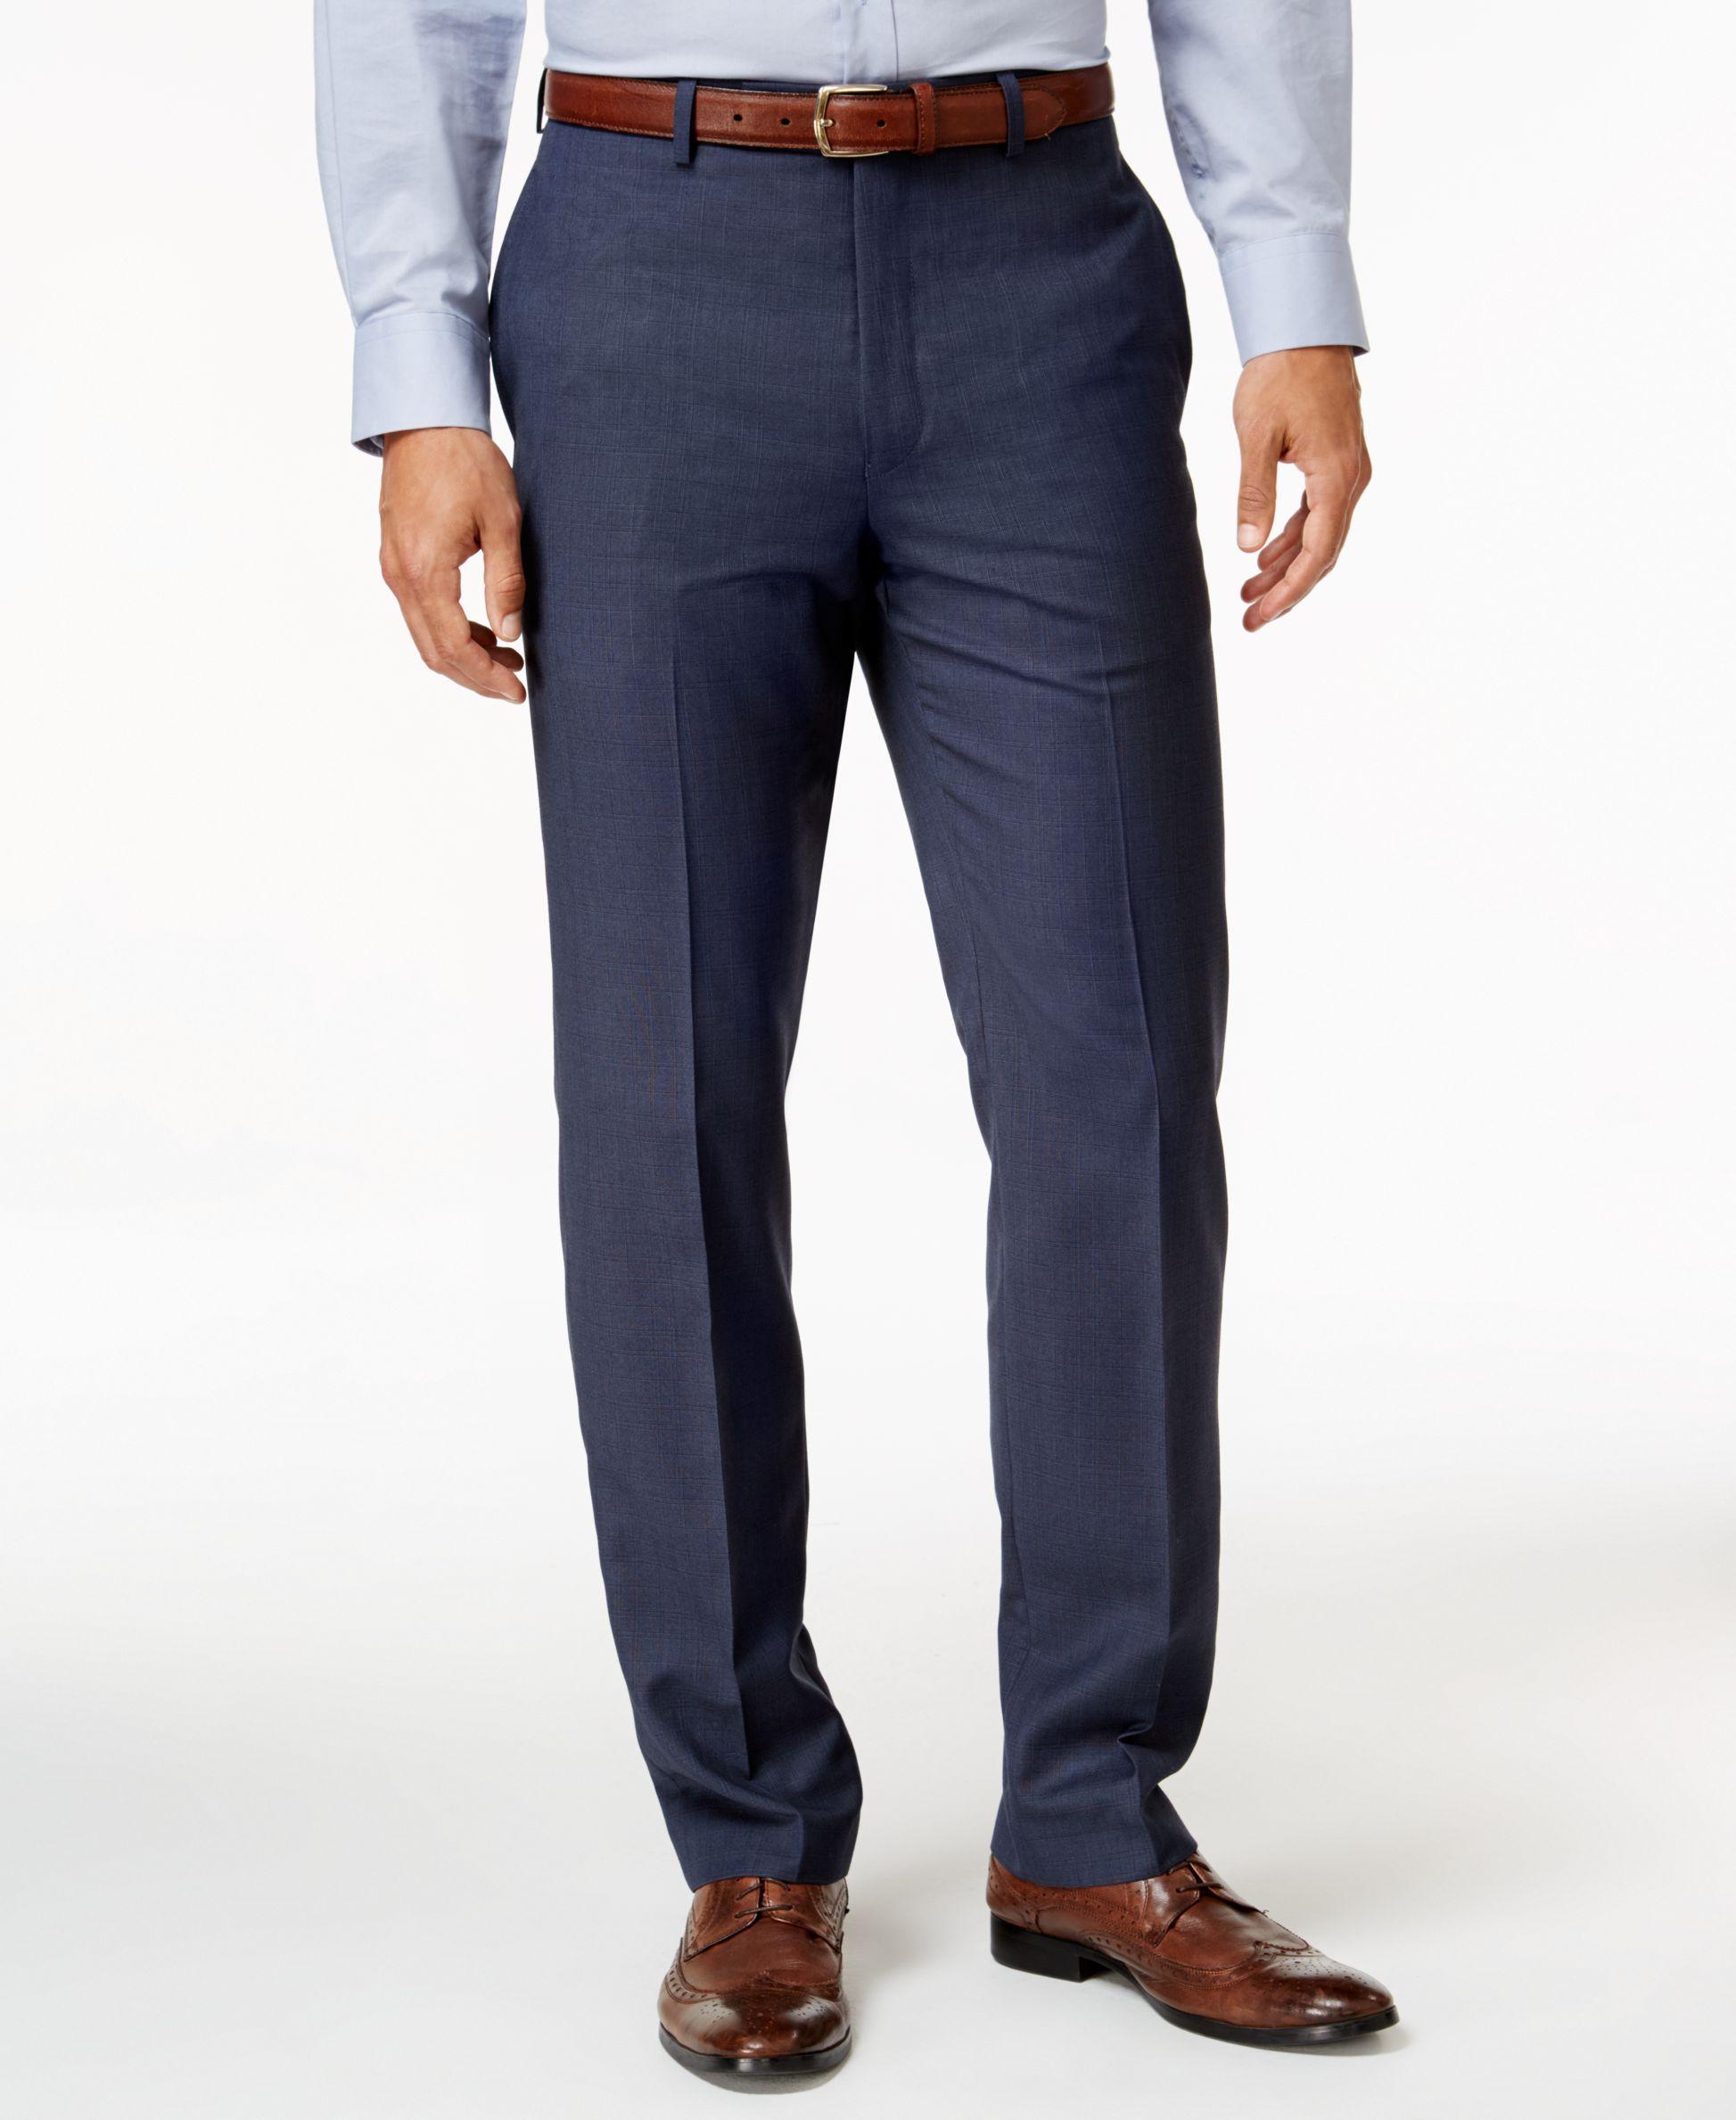 37+ Mens dress pants slim fit information